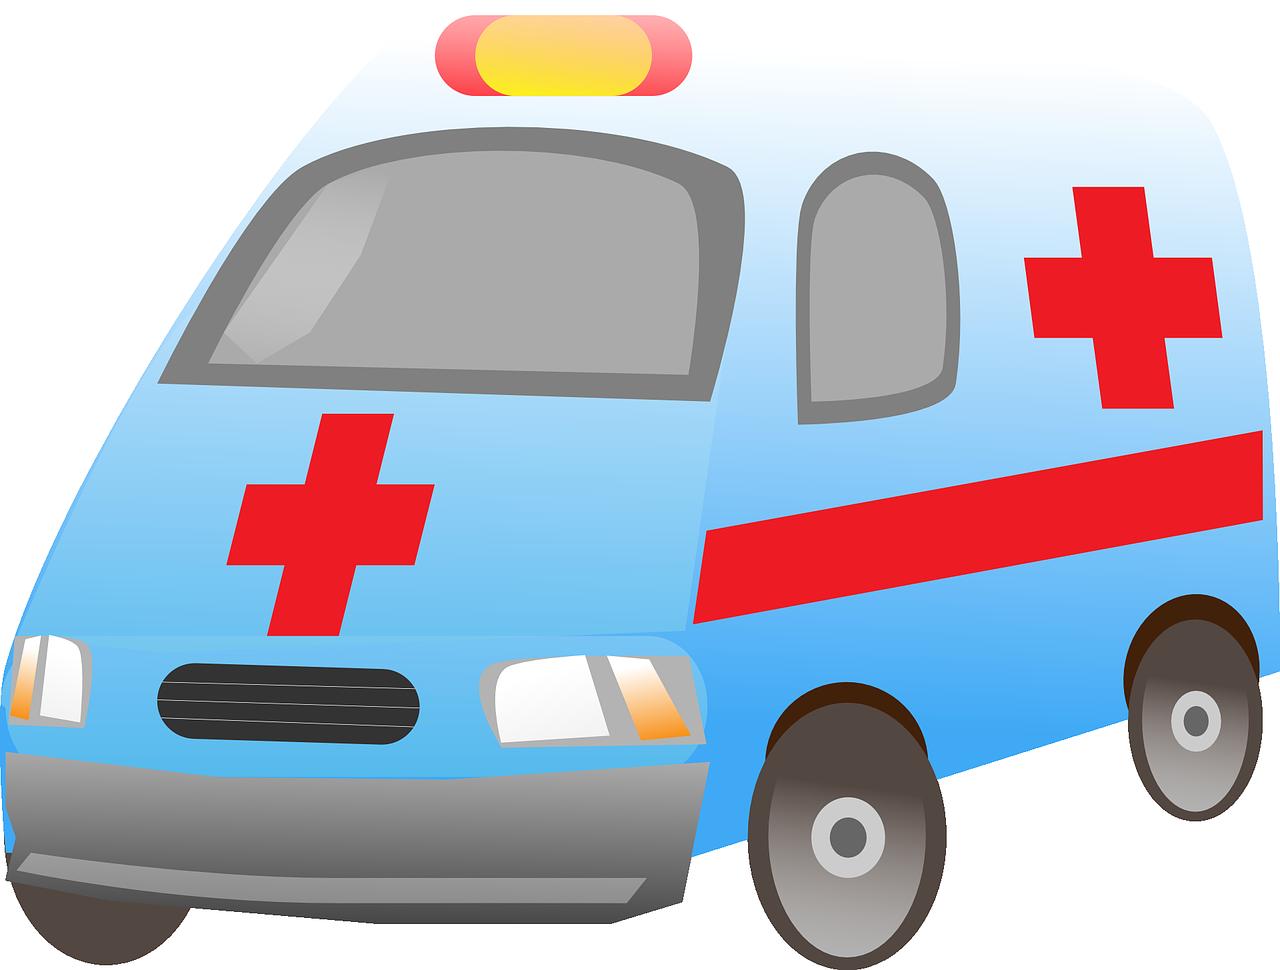 ambulance-155854_1280.png